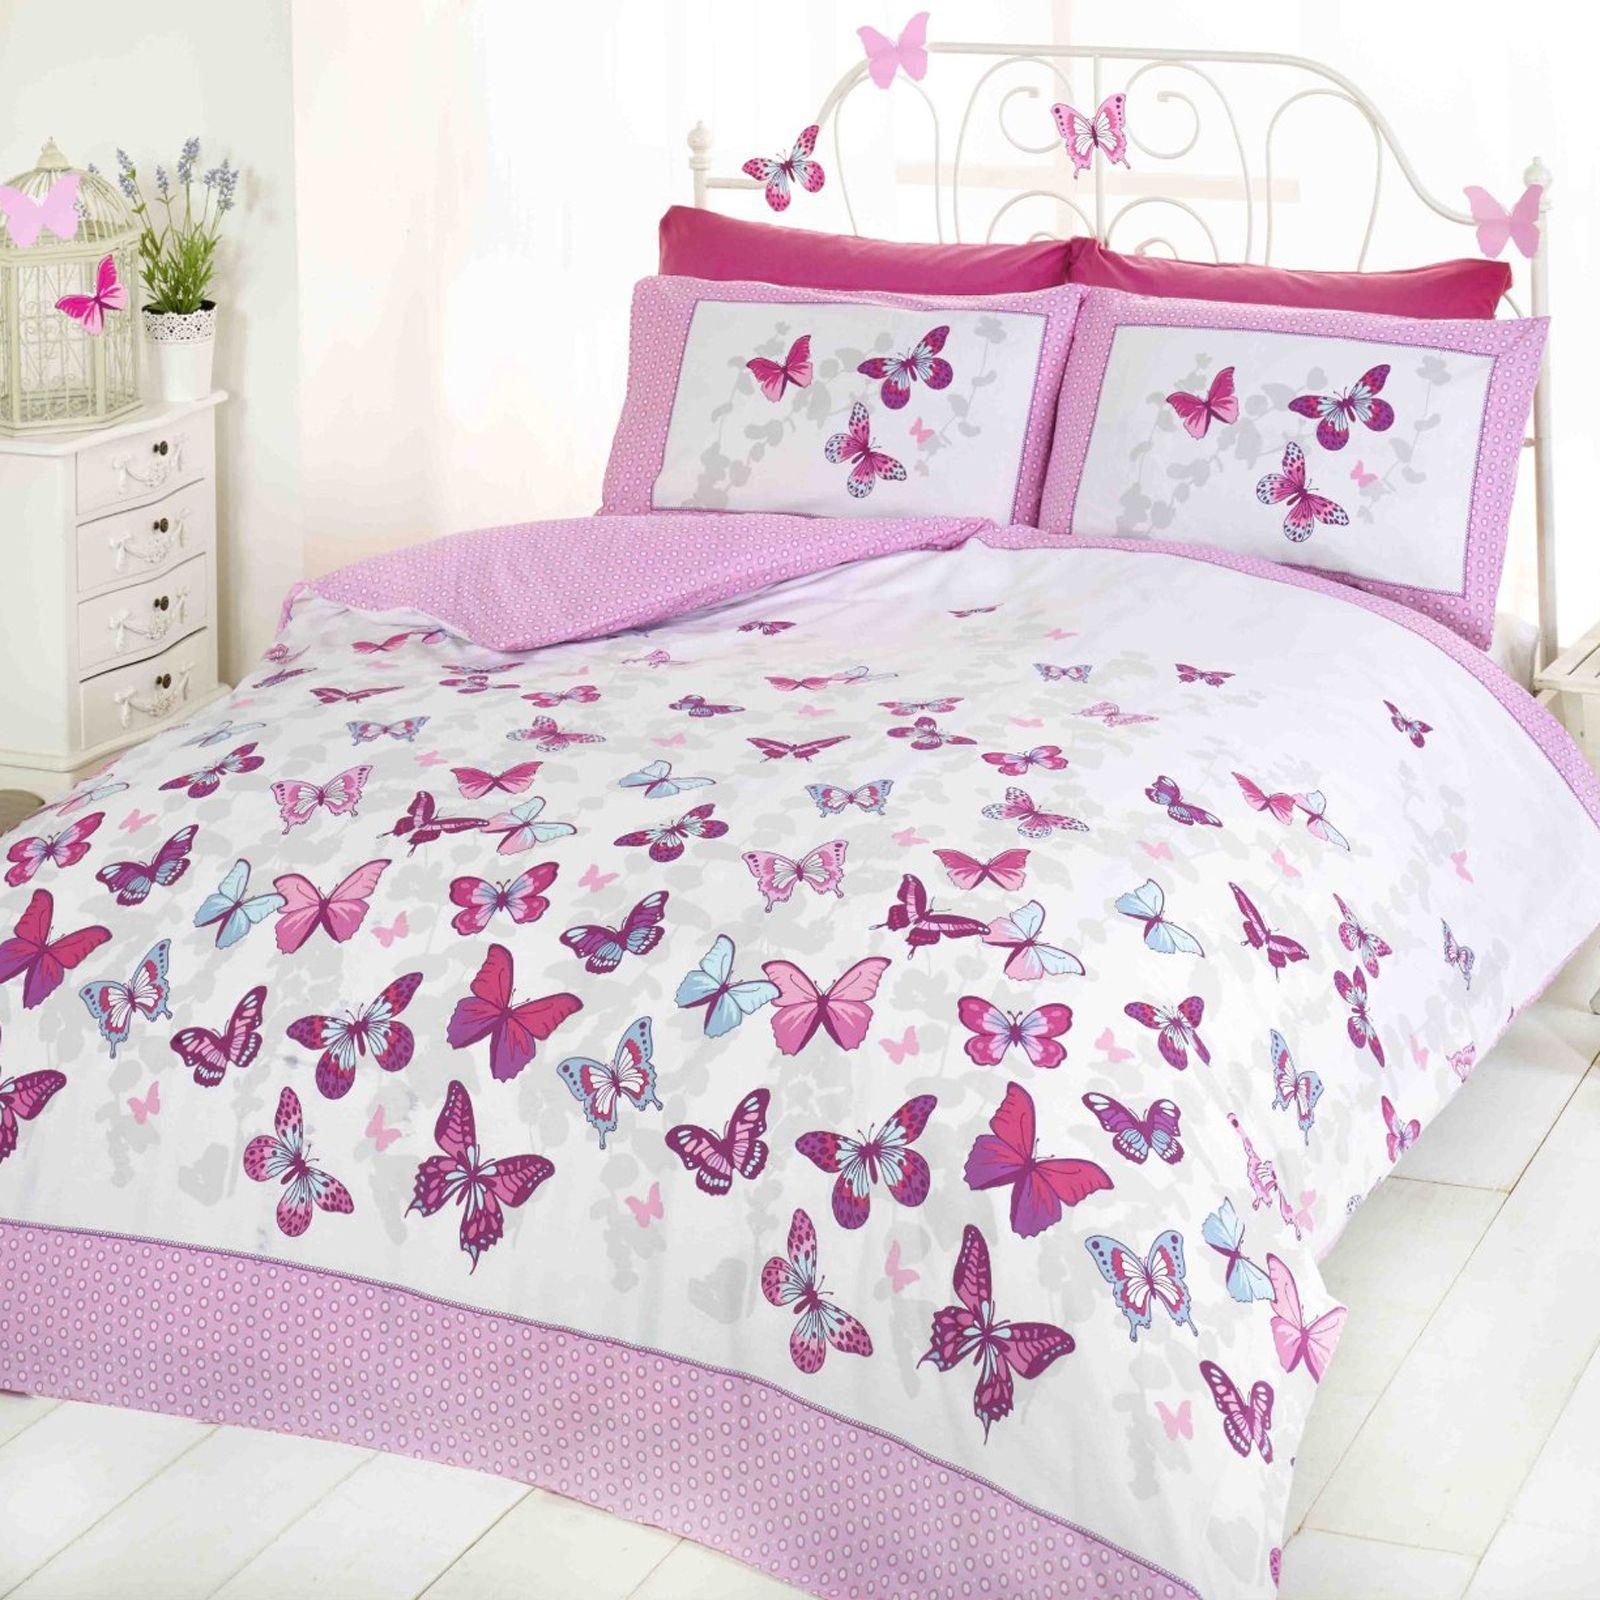 Girls Doona Covers | Princess Girls Quilt Cover Set Girls Bedding ...